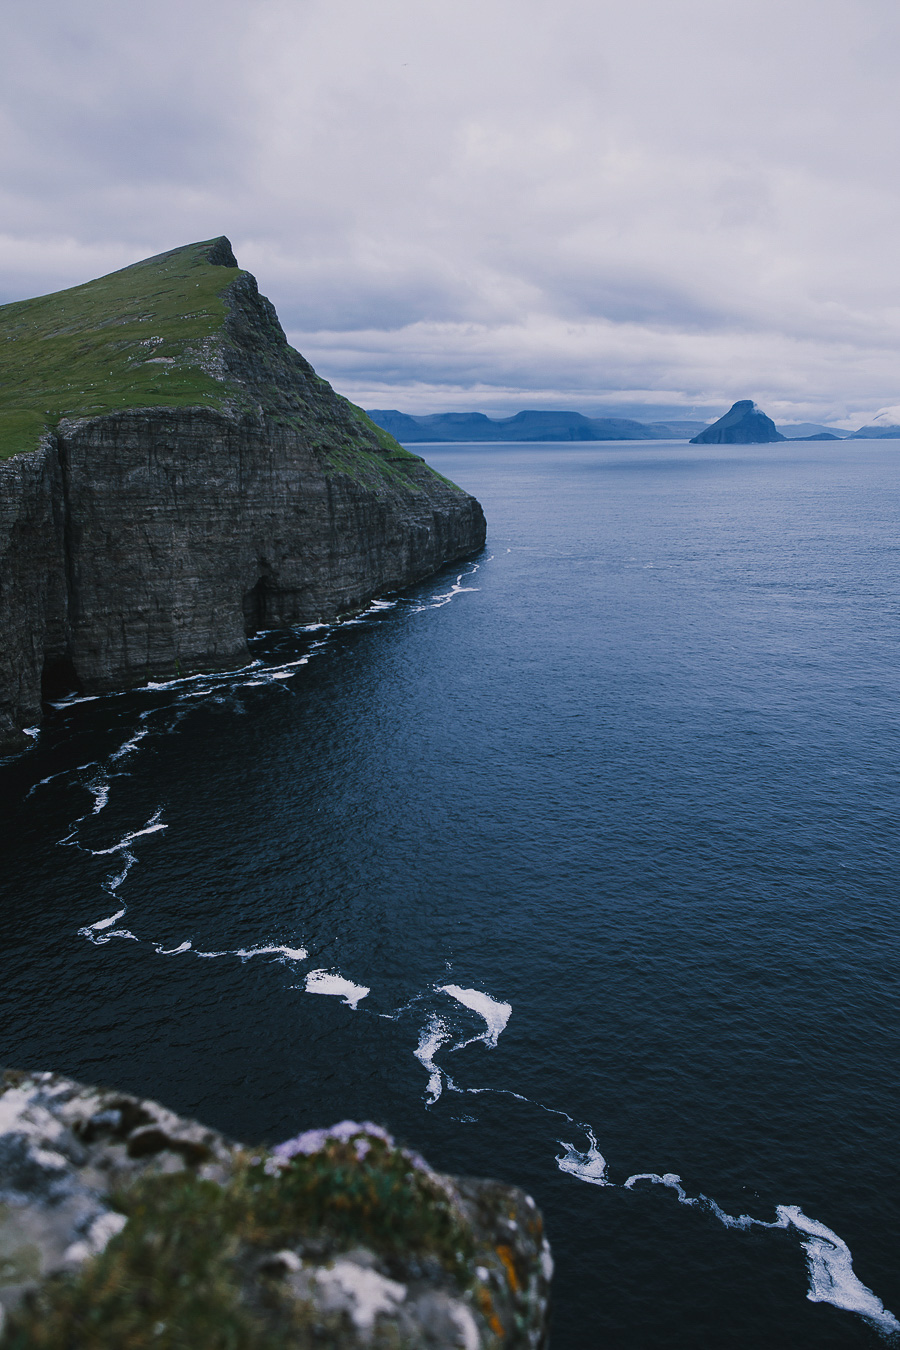 Blue ocean and mountains in Faroe Islands